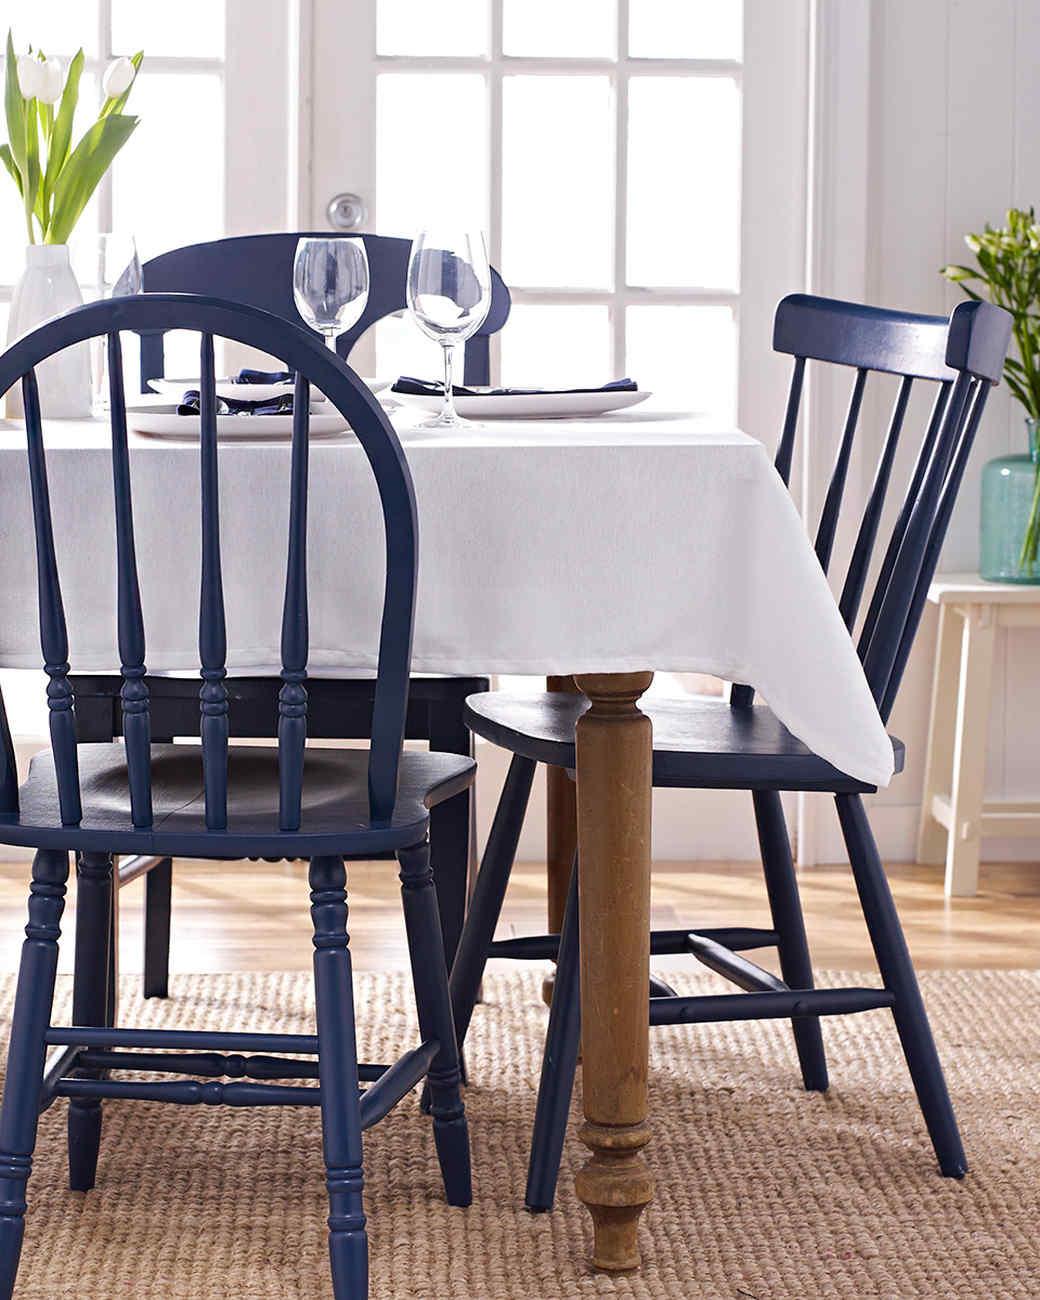 plaid decor chairs & Painted Wooden Chairs | Martha Stewart